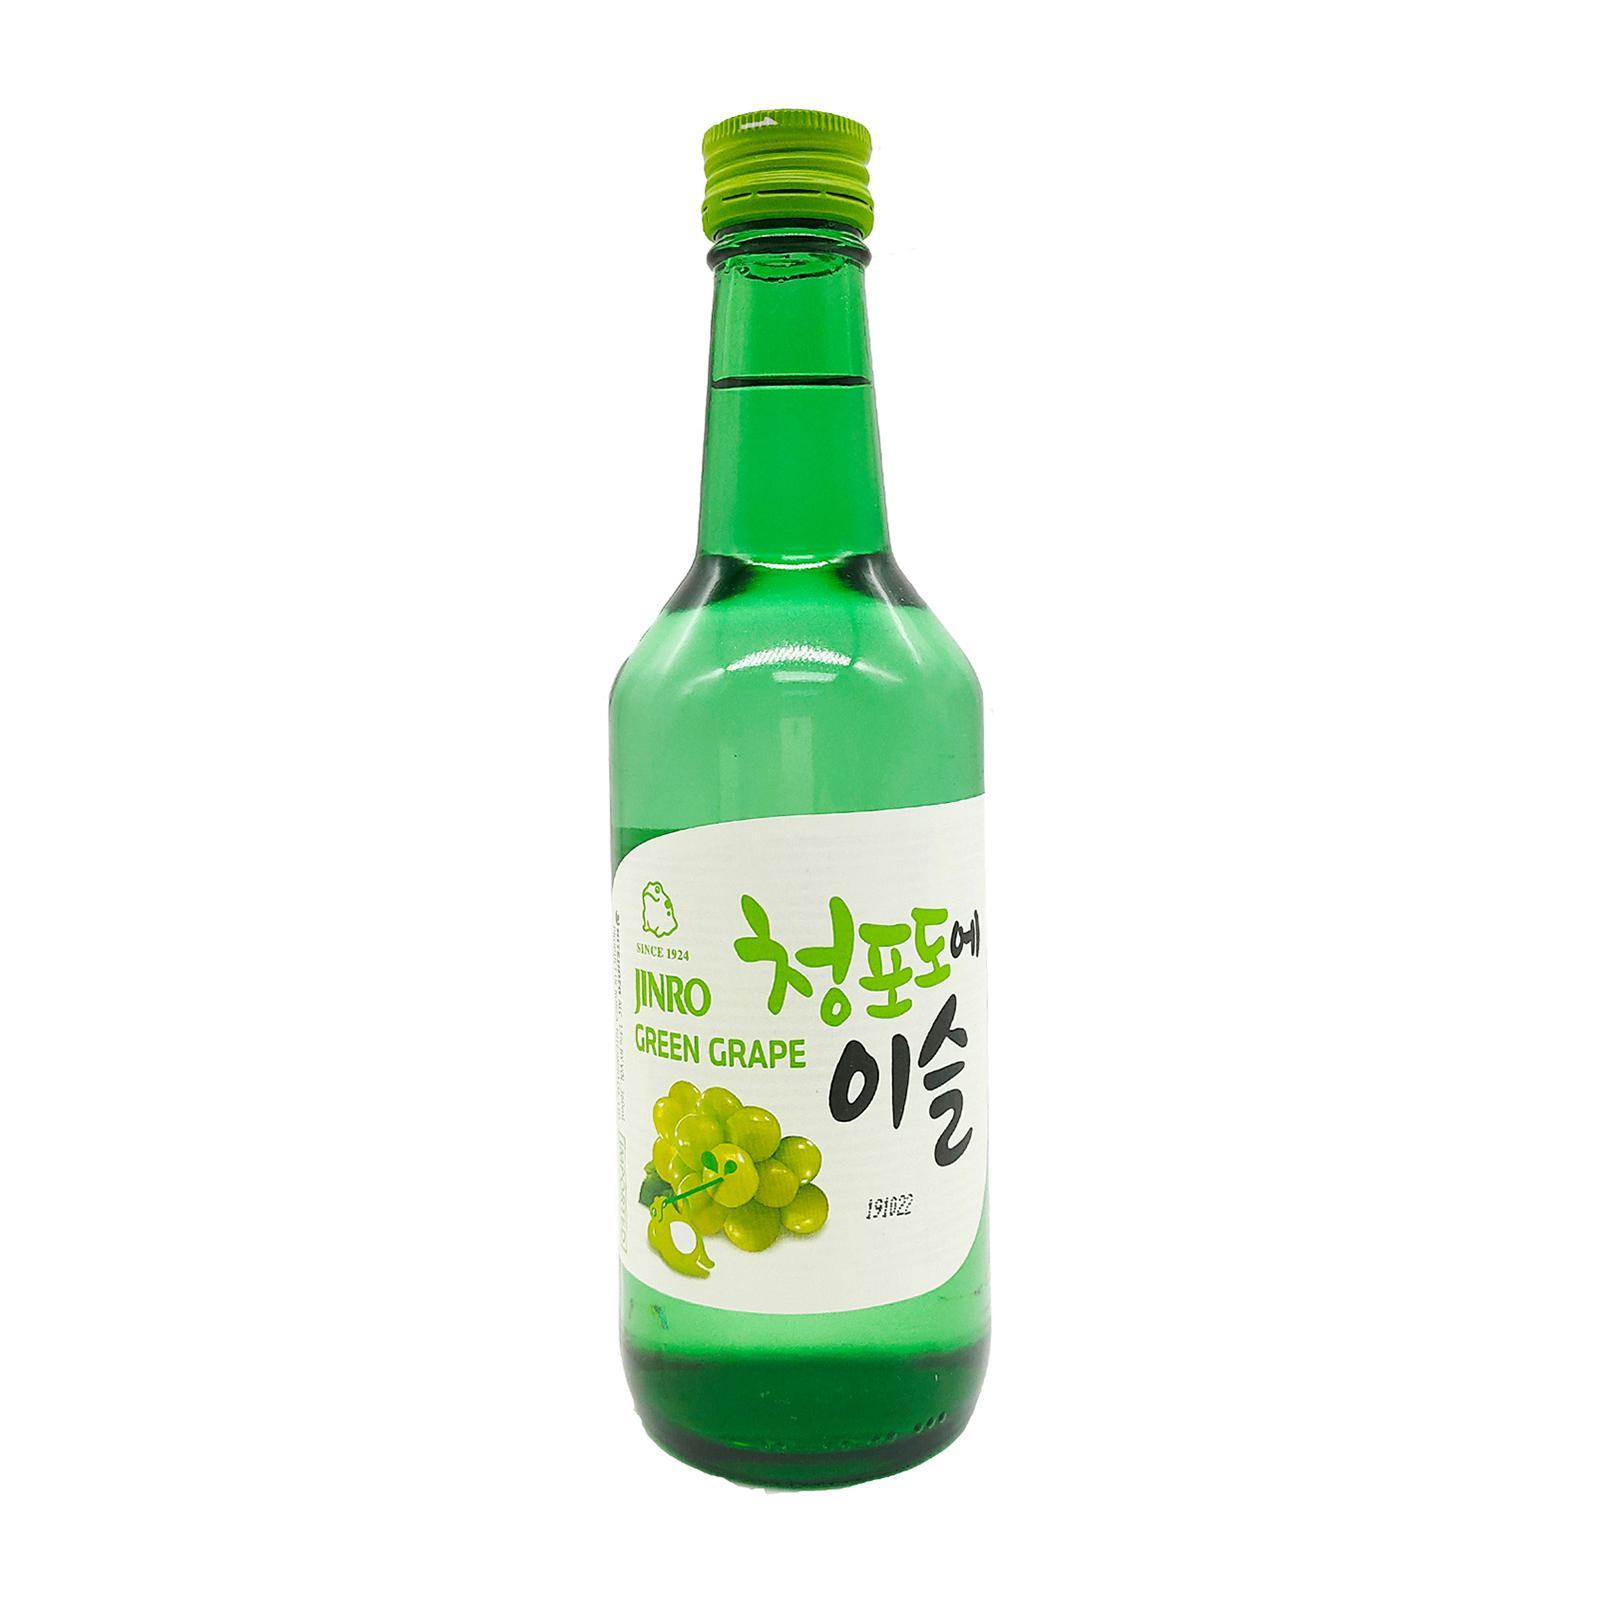 Jinro Green Grape 360ml Bottle Soju